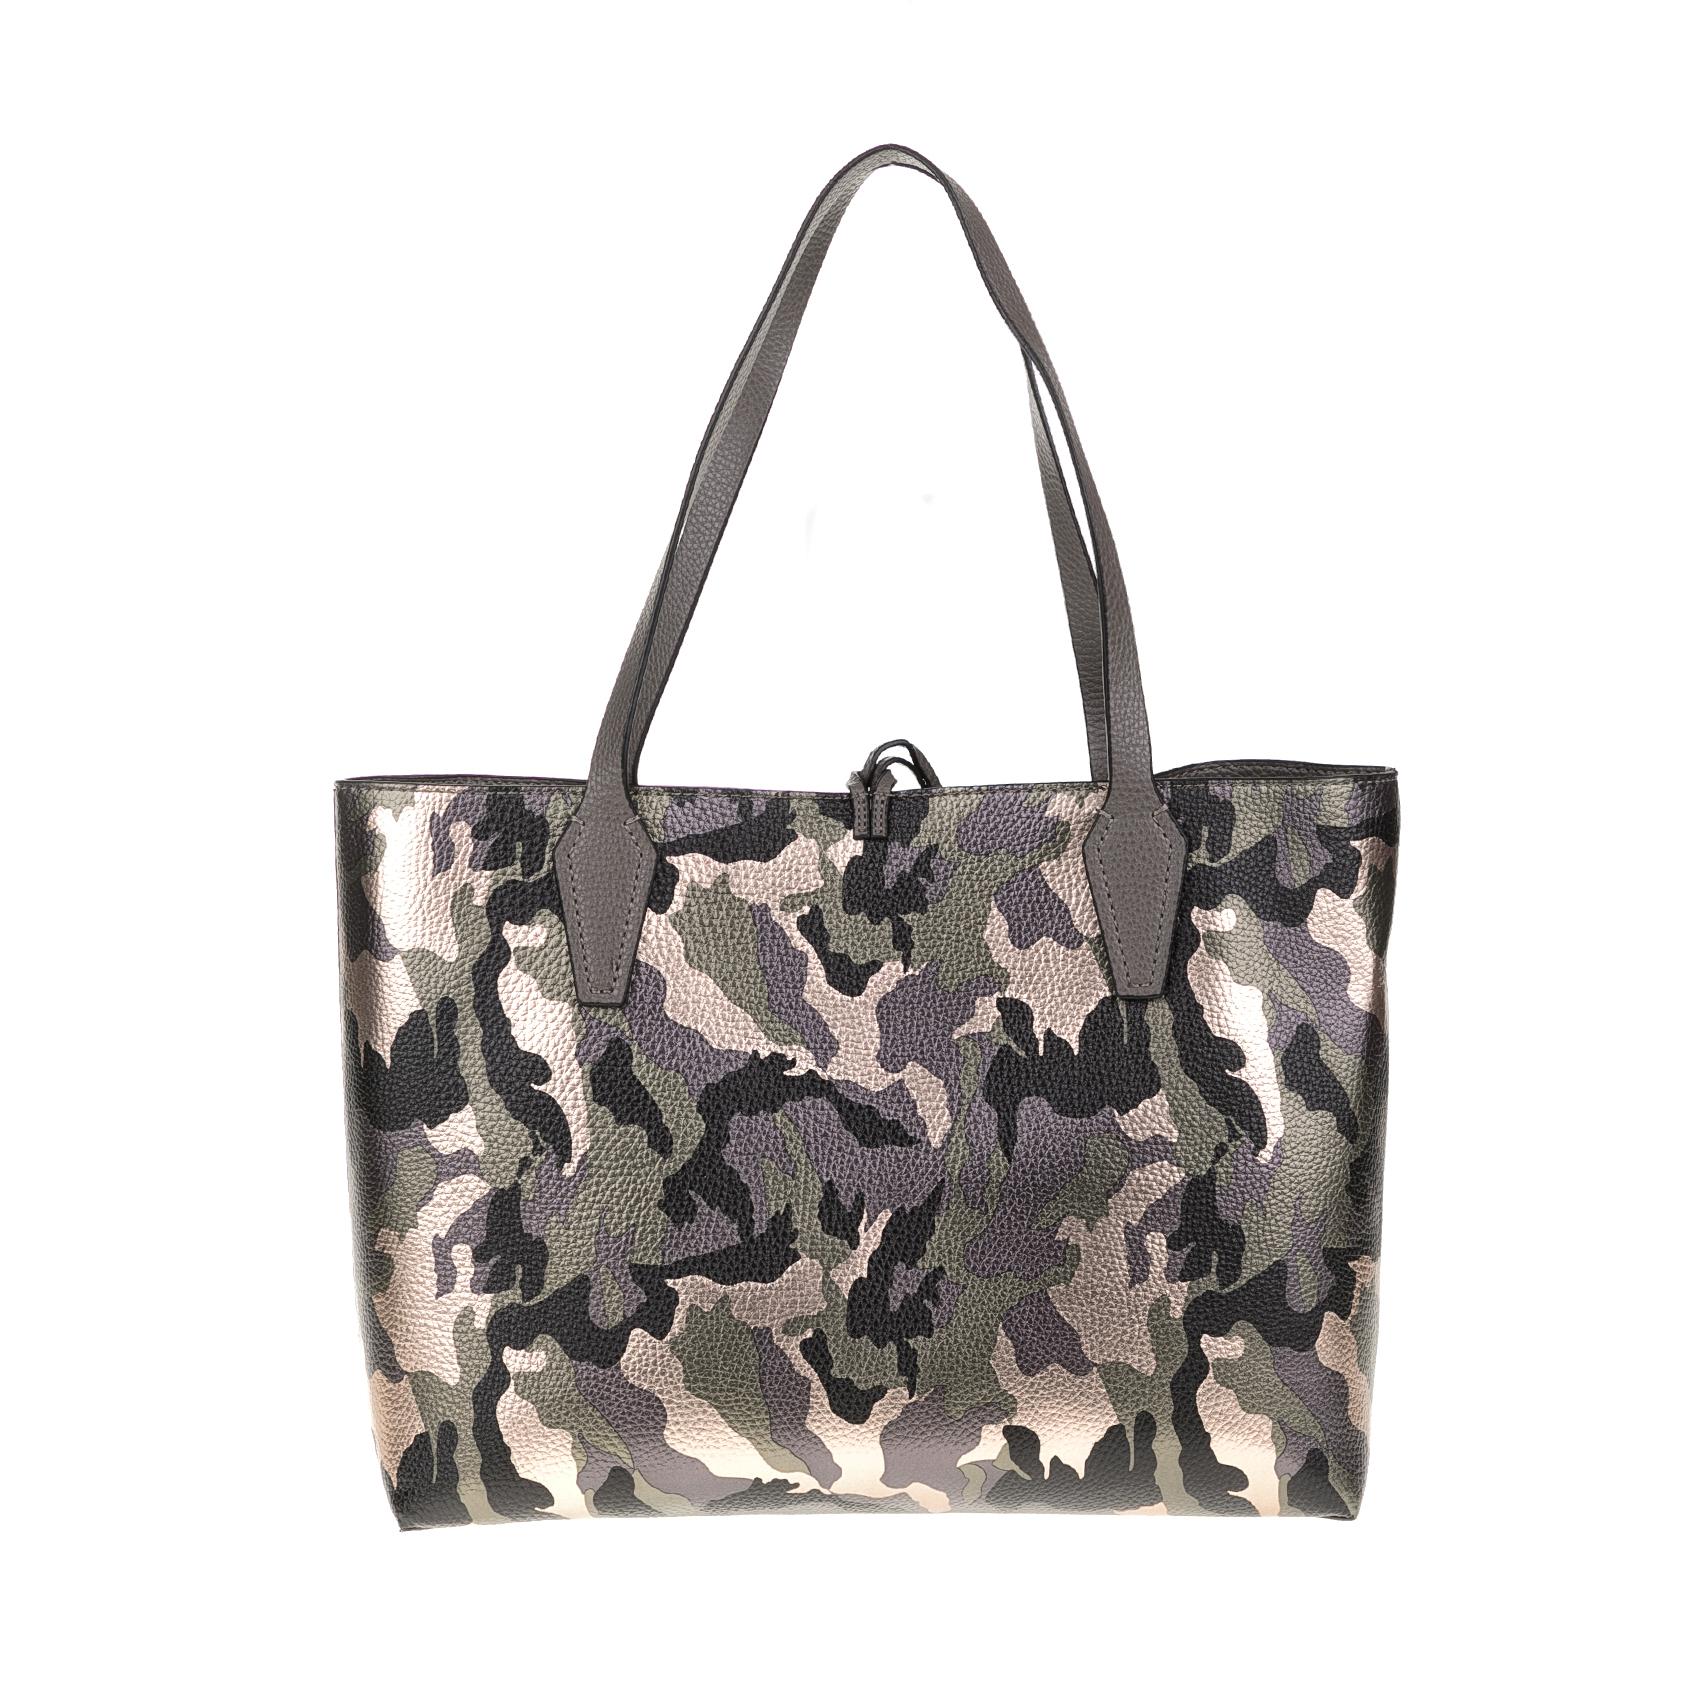 GUESS – Γυναικεία τσάντα ώμου GUESS BOBBI γκρι-χακί 1571311.0-8480